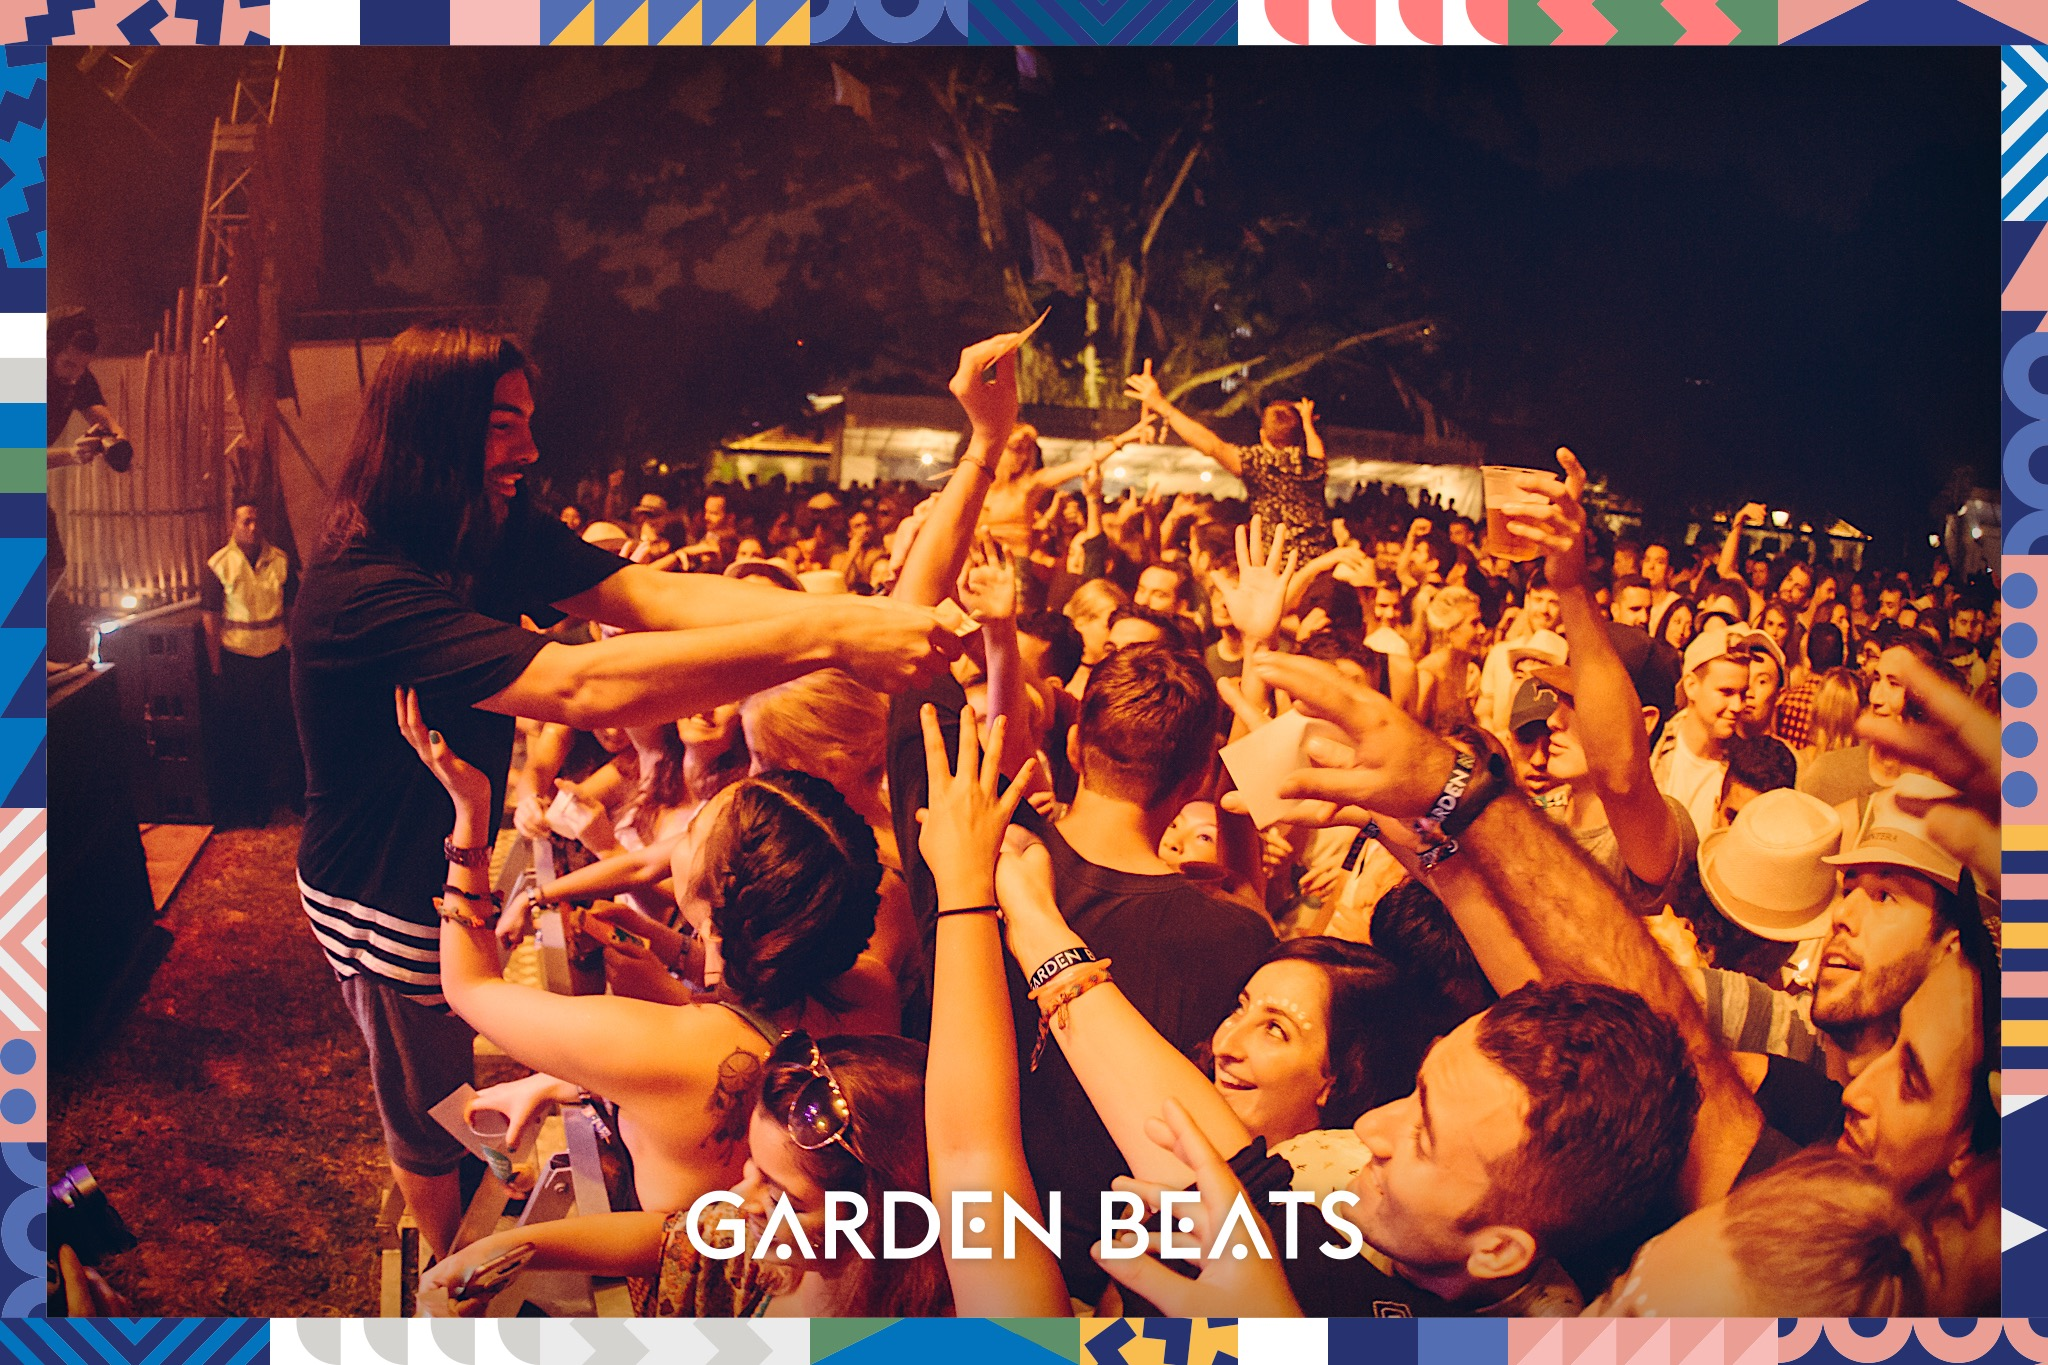 18032017_GardenBeats_Colossal829_WatermarkedGB.jpg